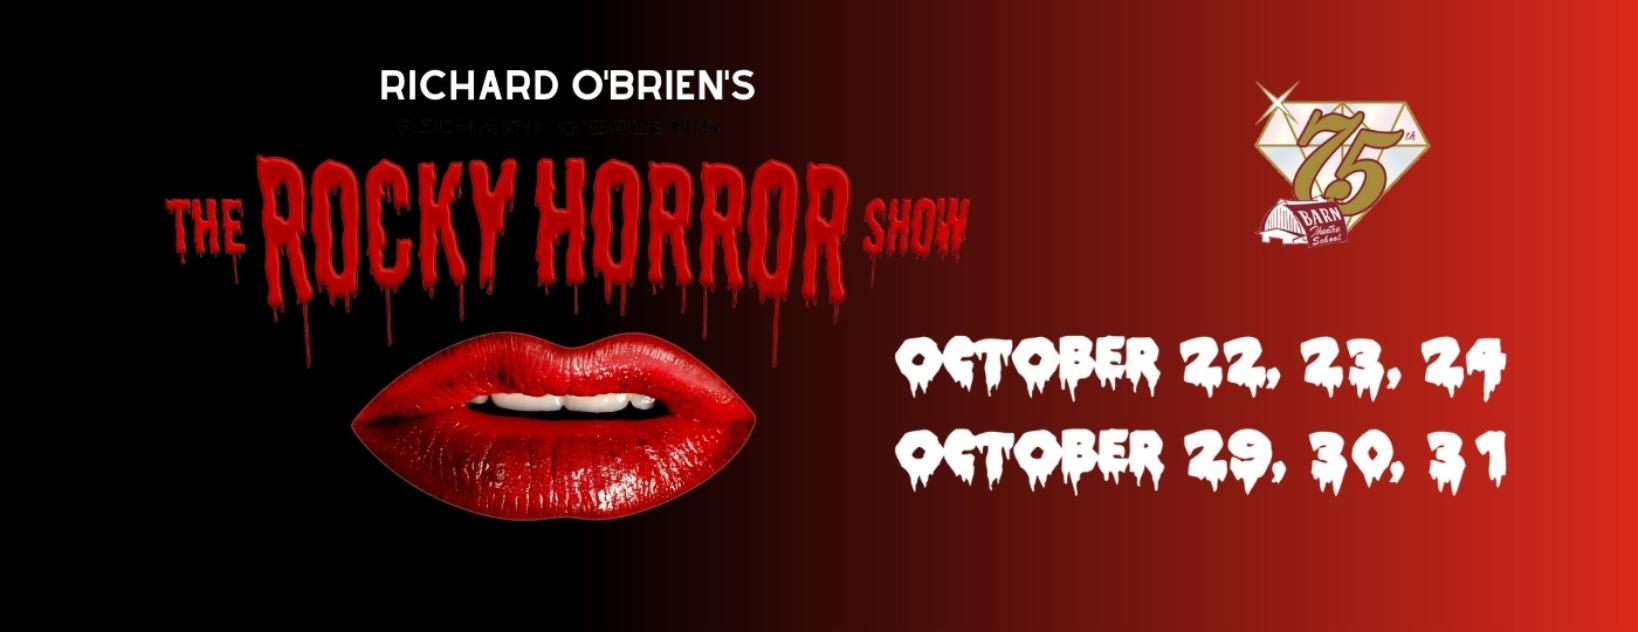 Barn Rocky Horror 2021 Show Web Slider